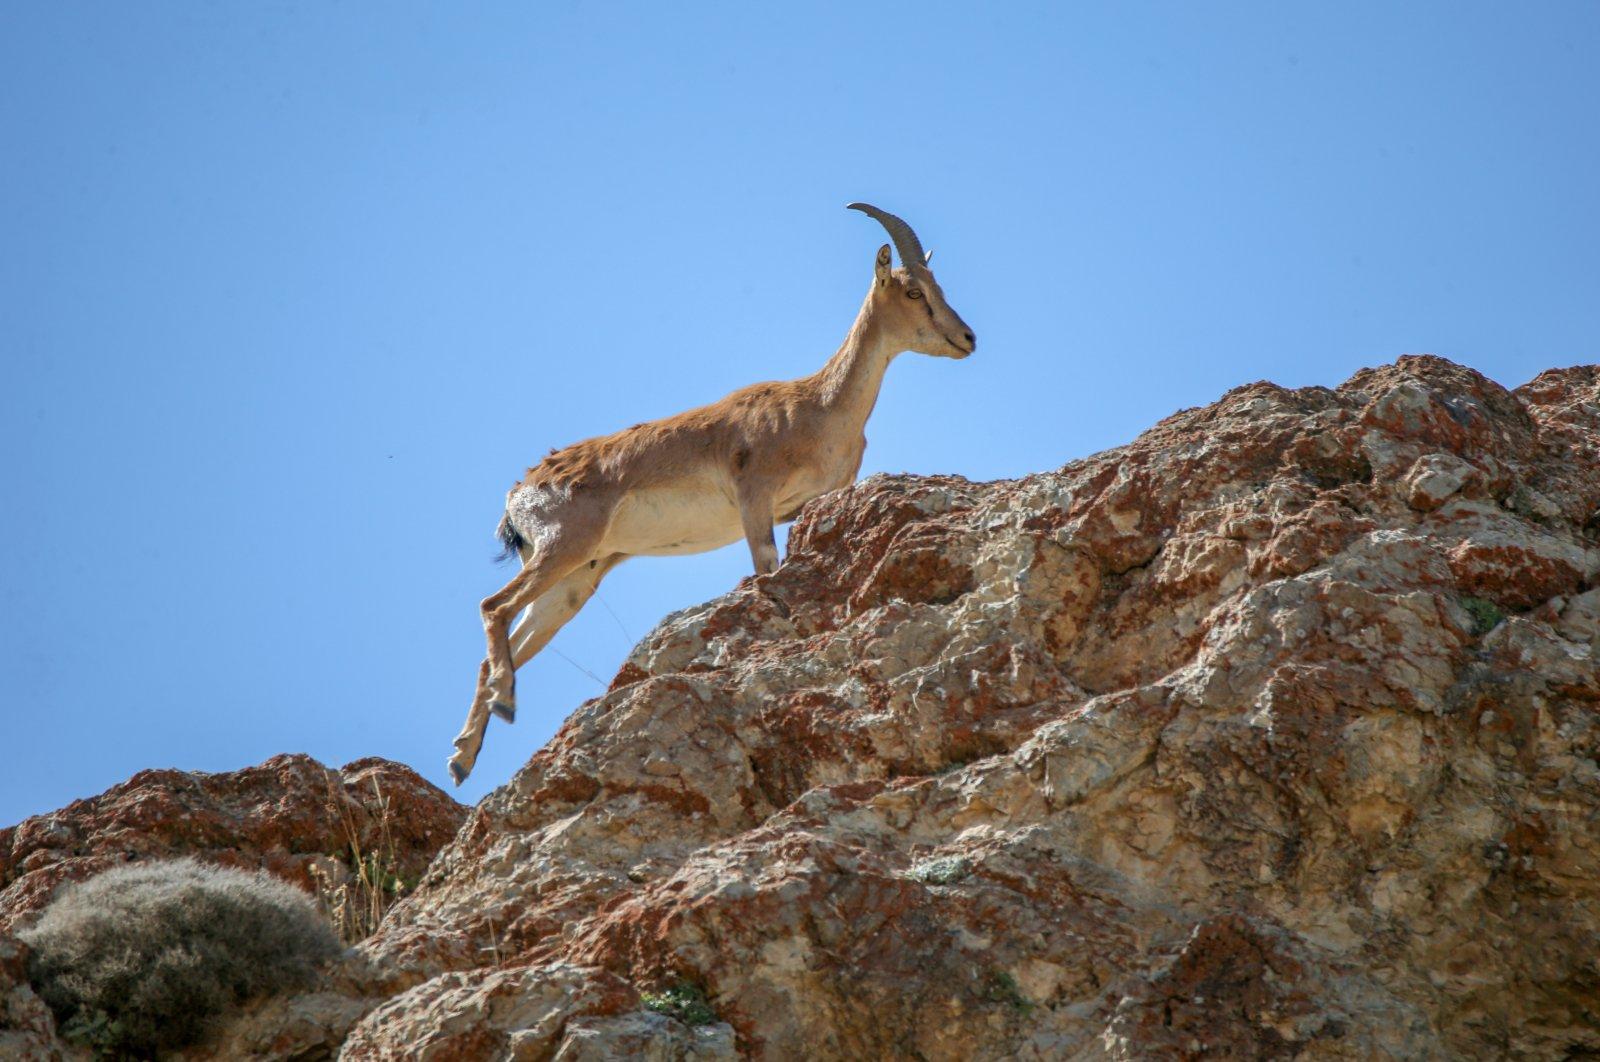 A wild goat climbs a rock in Van, eastern Turkey, Sept. 14, 2020. (AA Photo)